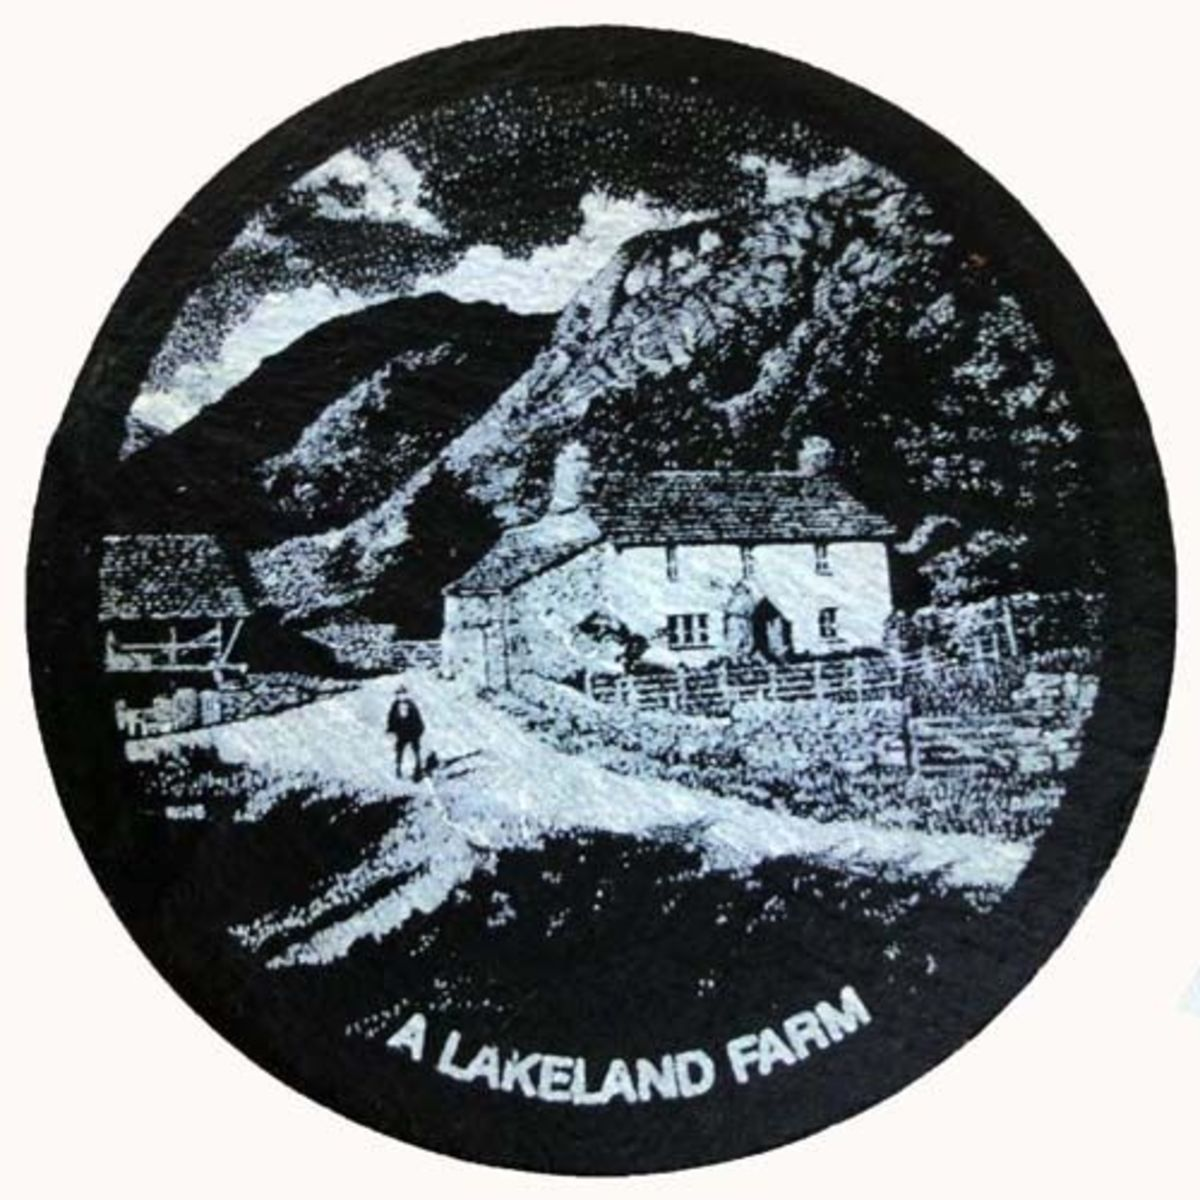 Slate coaser of Lakeland Farm in the Lake District, England.